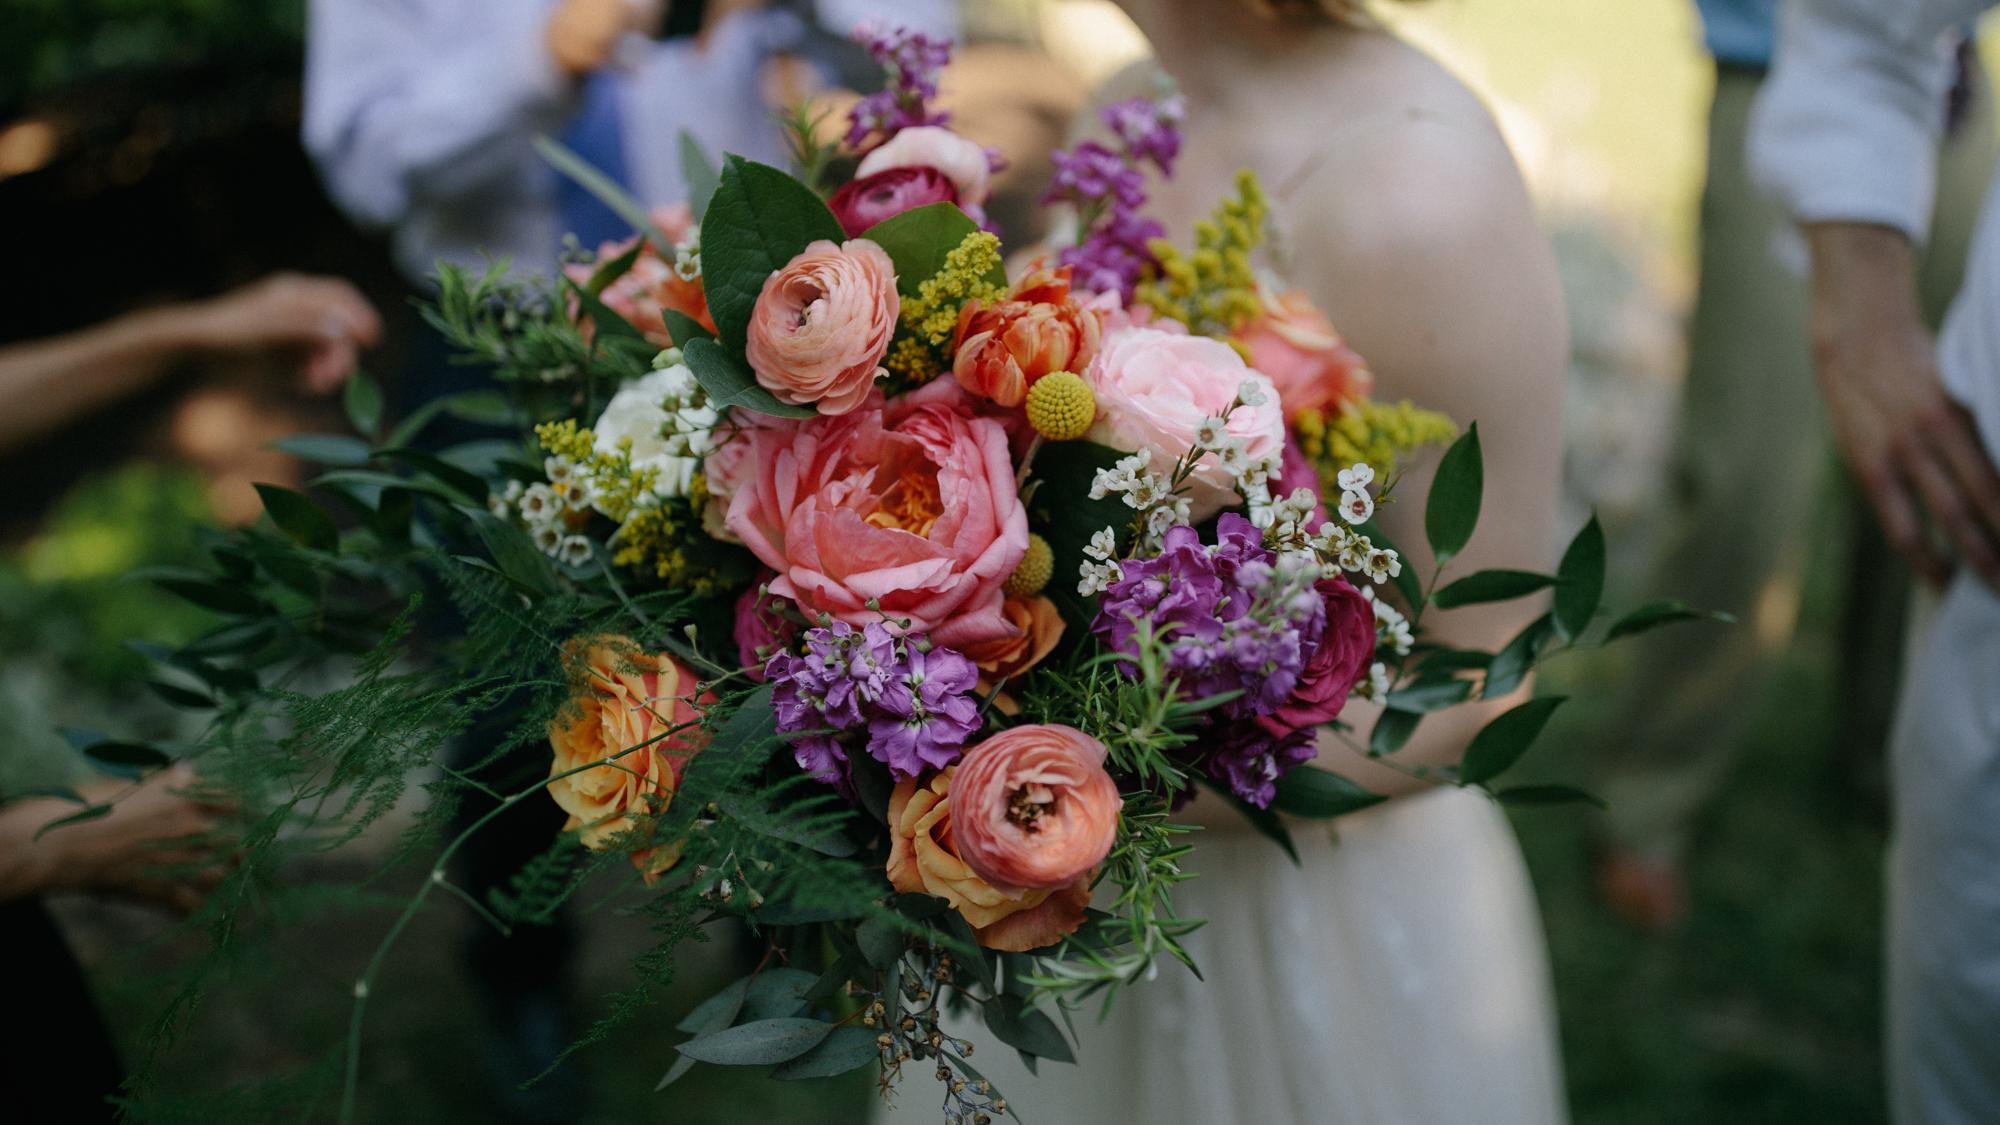 alec_vanderboom_kansas_city_mo_wedding_photos-0047.jpg